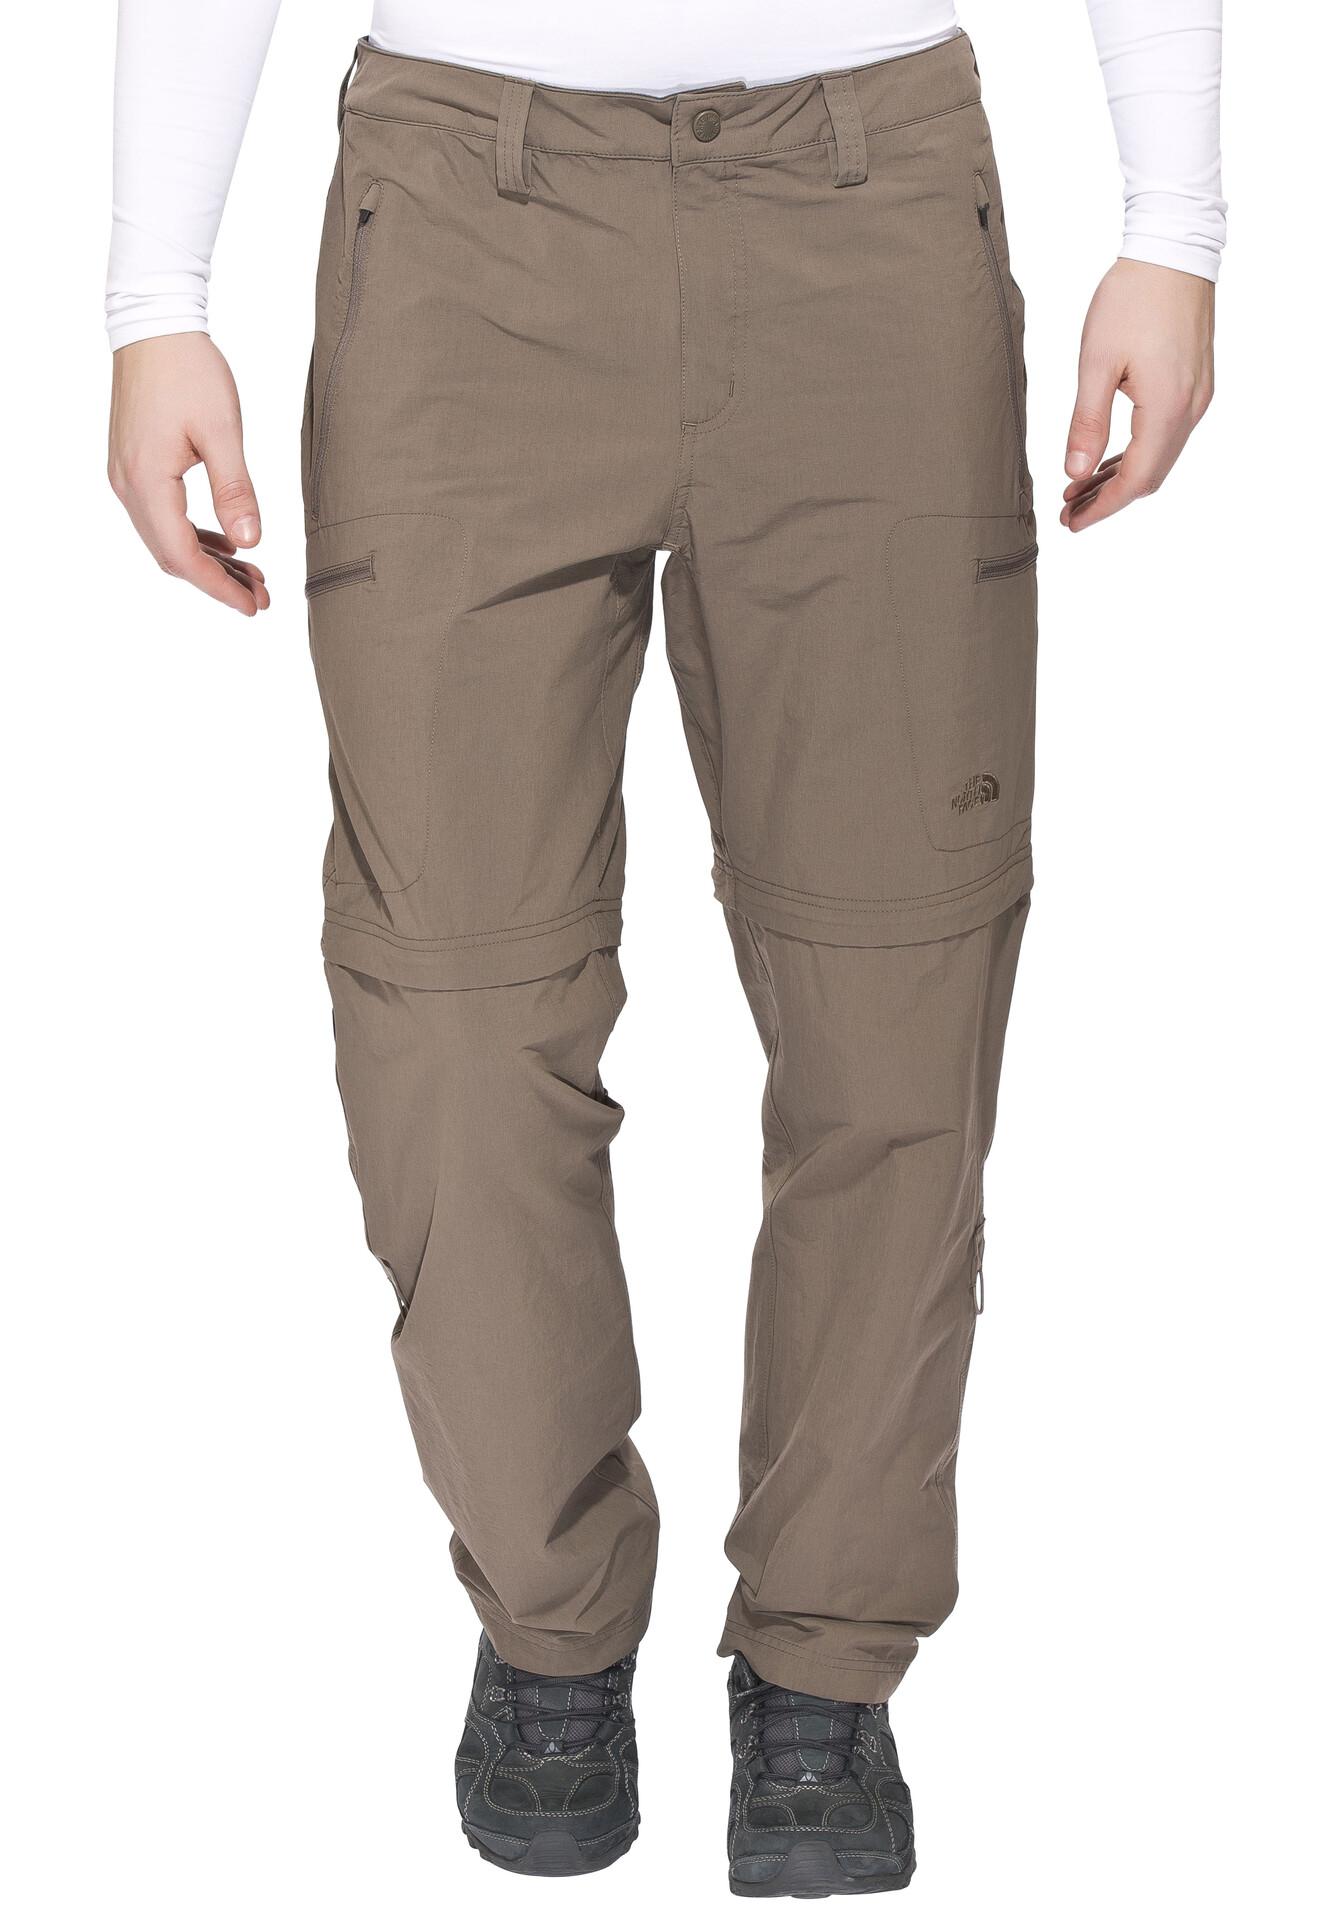 The North Face Exploration Convertible Pant Men Herren Wanderhose// Zip Off Hose